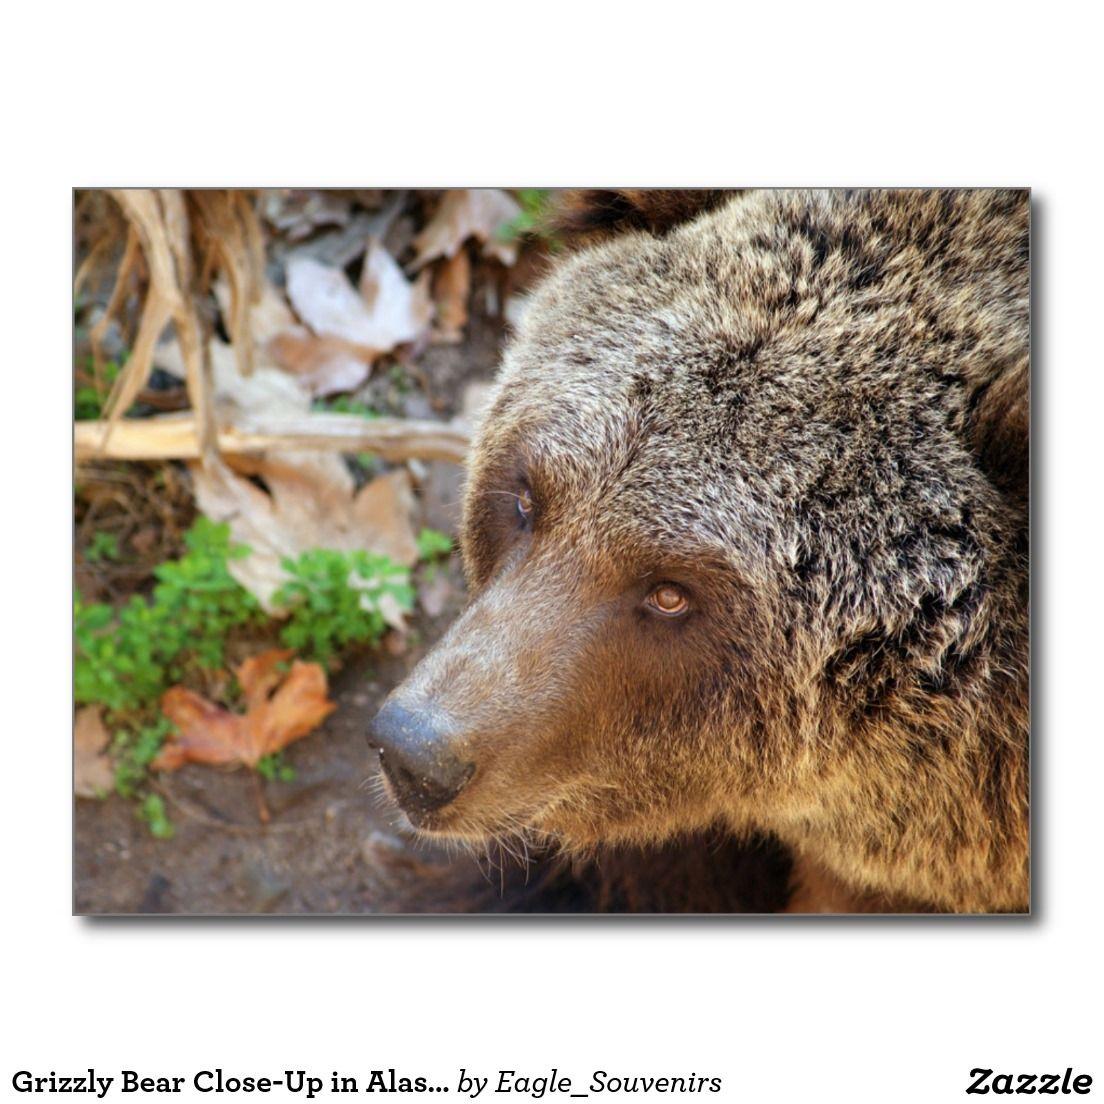 Grizzly Bear Close-Up in Alaska Postcard  #grizzly #bear, #alaska, #wildlife, #carnivore, #mammal, #predator, #wilderness, #wild, #nature, #usa, #america #postcard